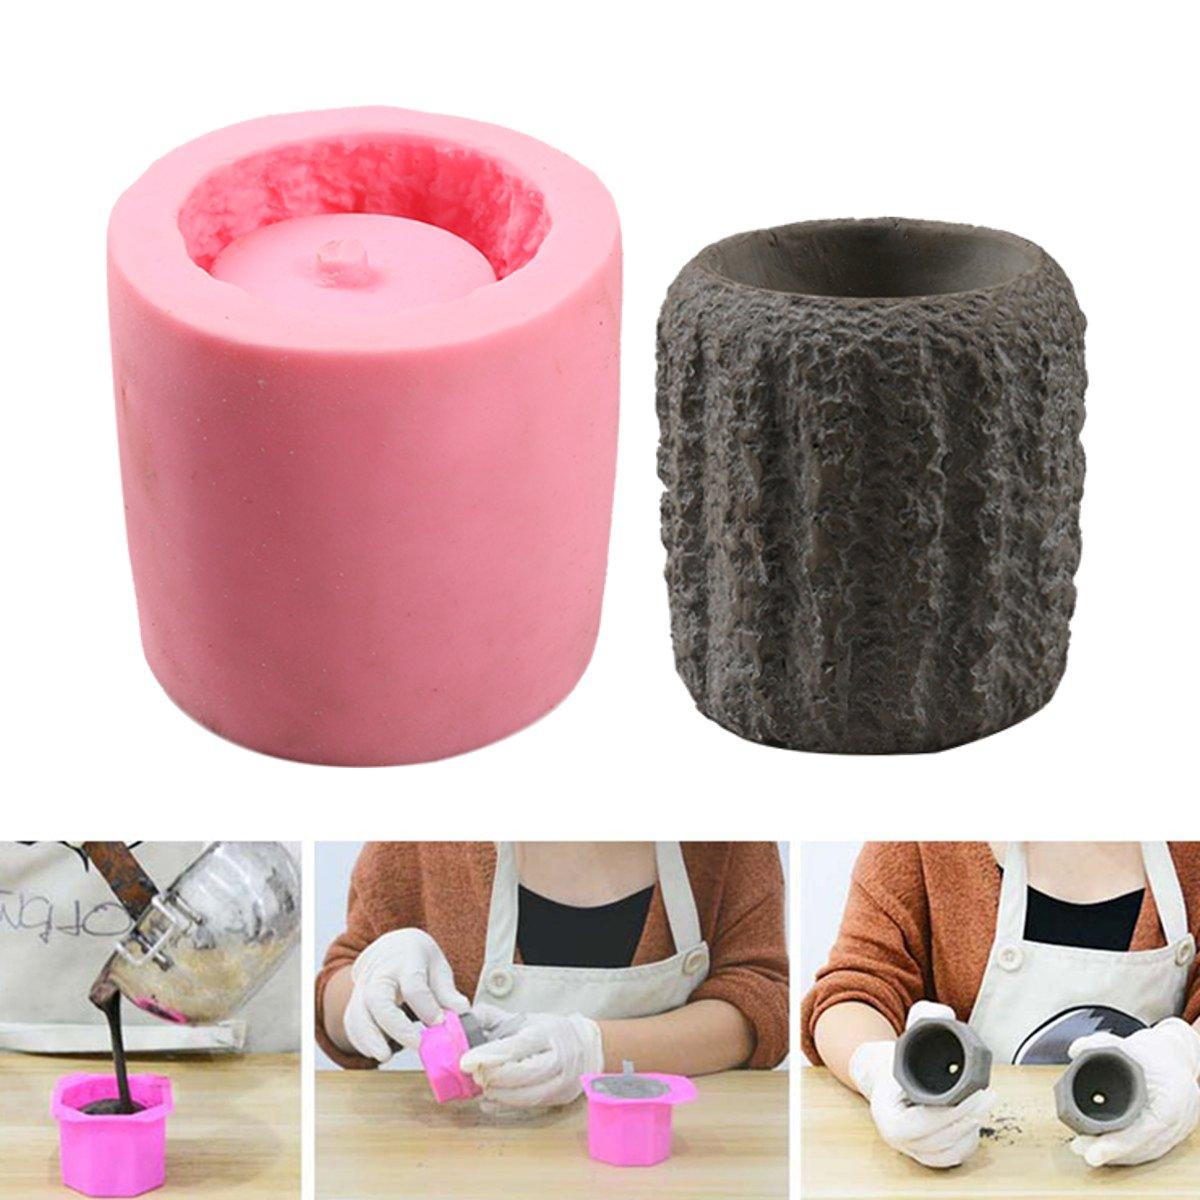 Crafts Silicone Mold Mould Non-Toxic Hexagon//Octagon Flower Pot DIY Vase Parts